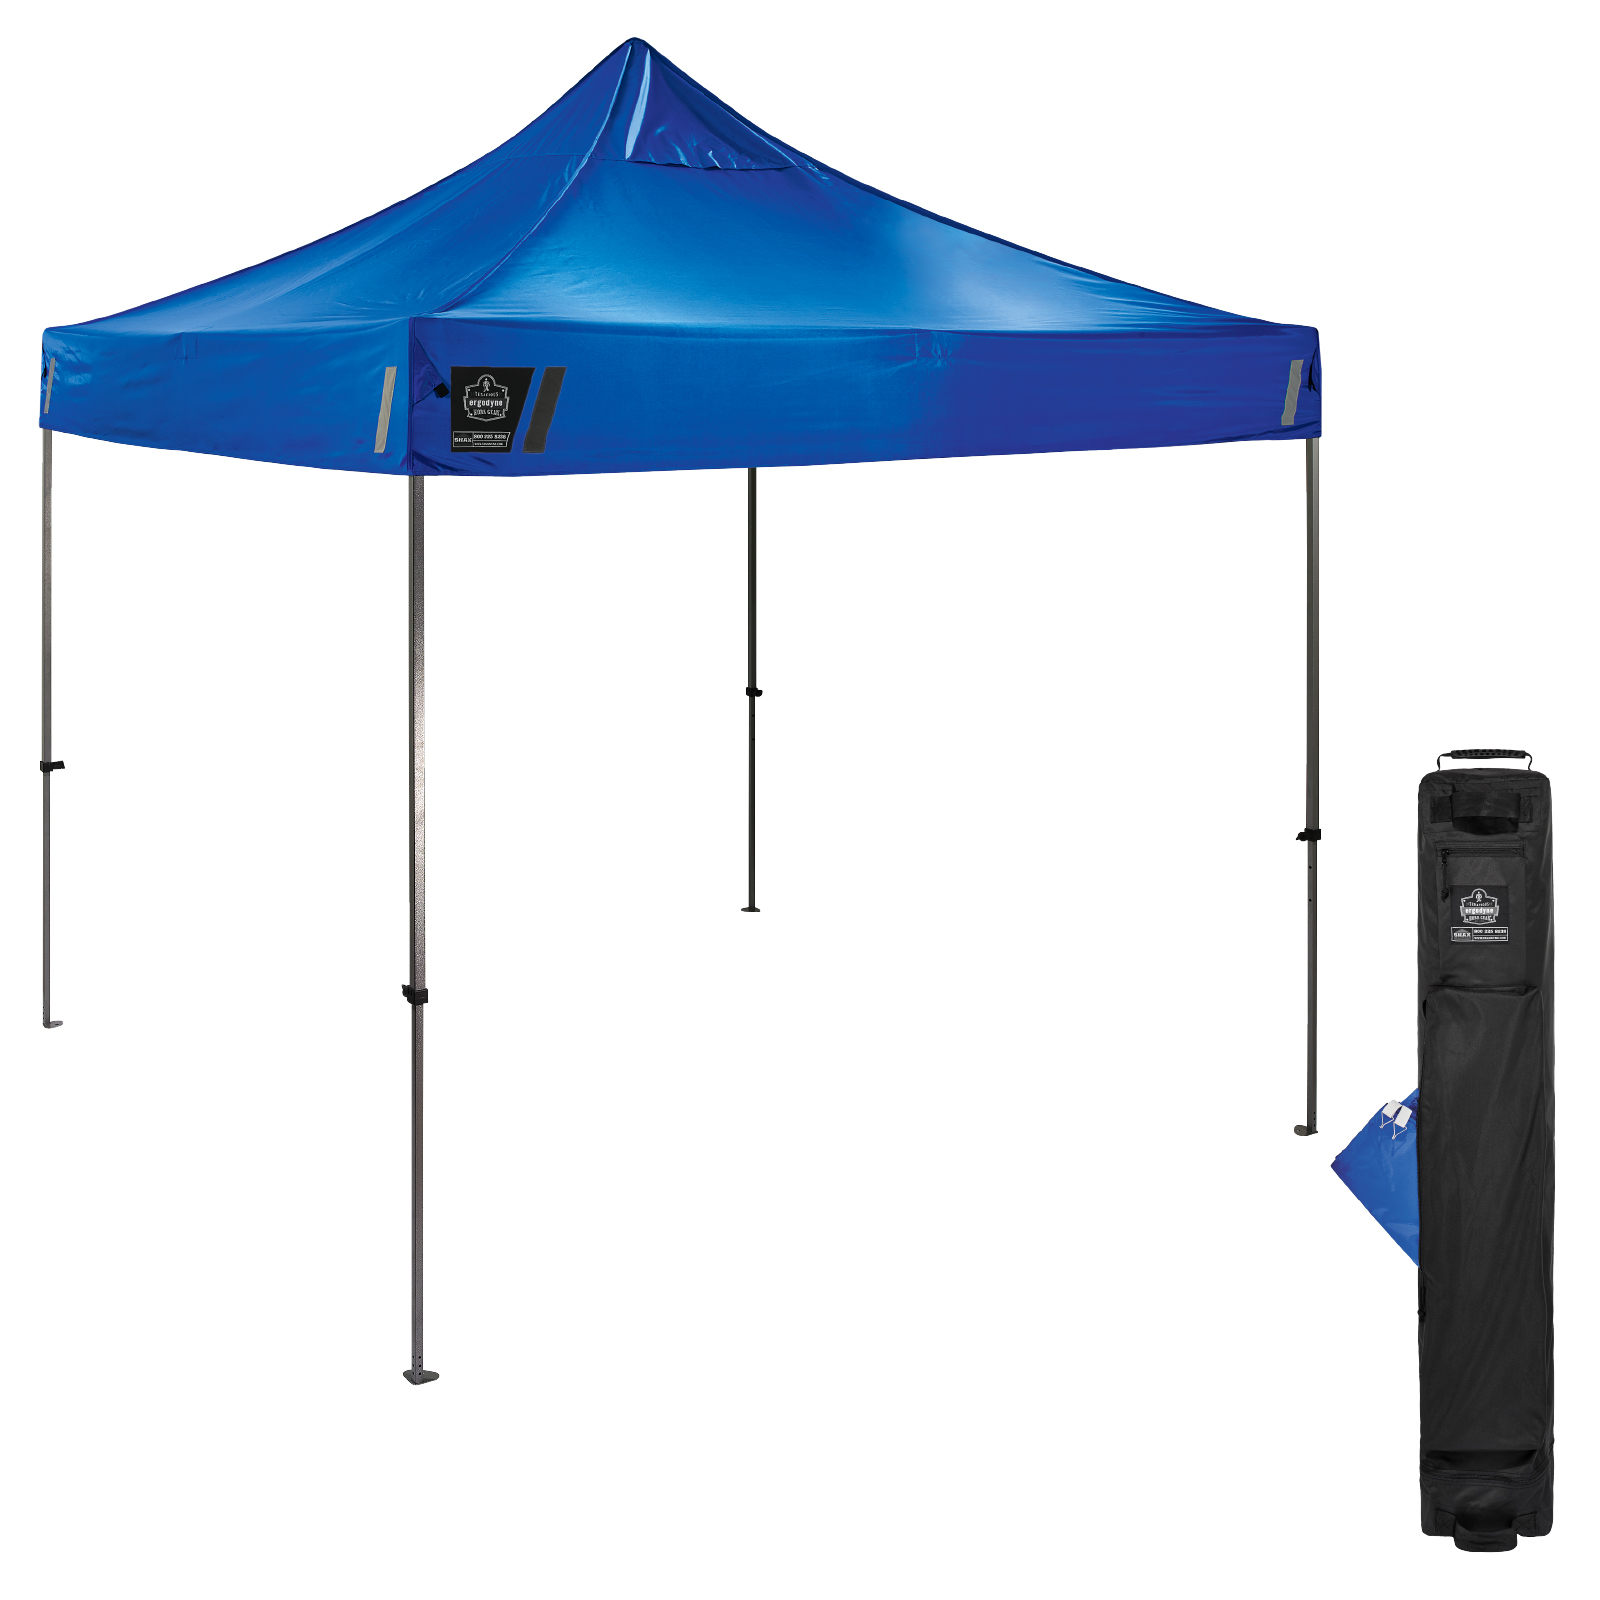 SHAX 6000 Heavy-Duty Pop-Up Tent - 10ft x 10ft / 3m x 3m